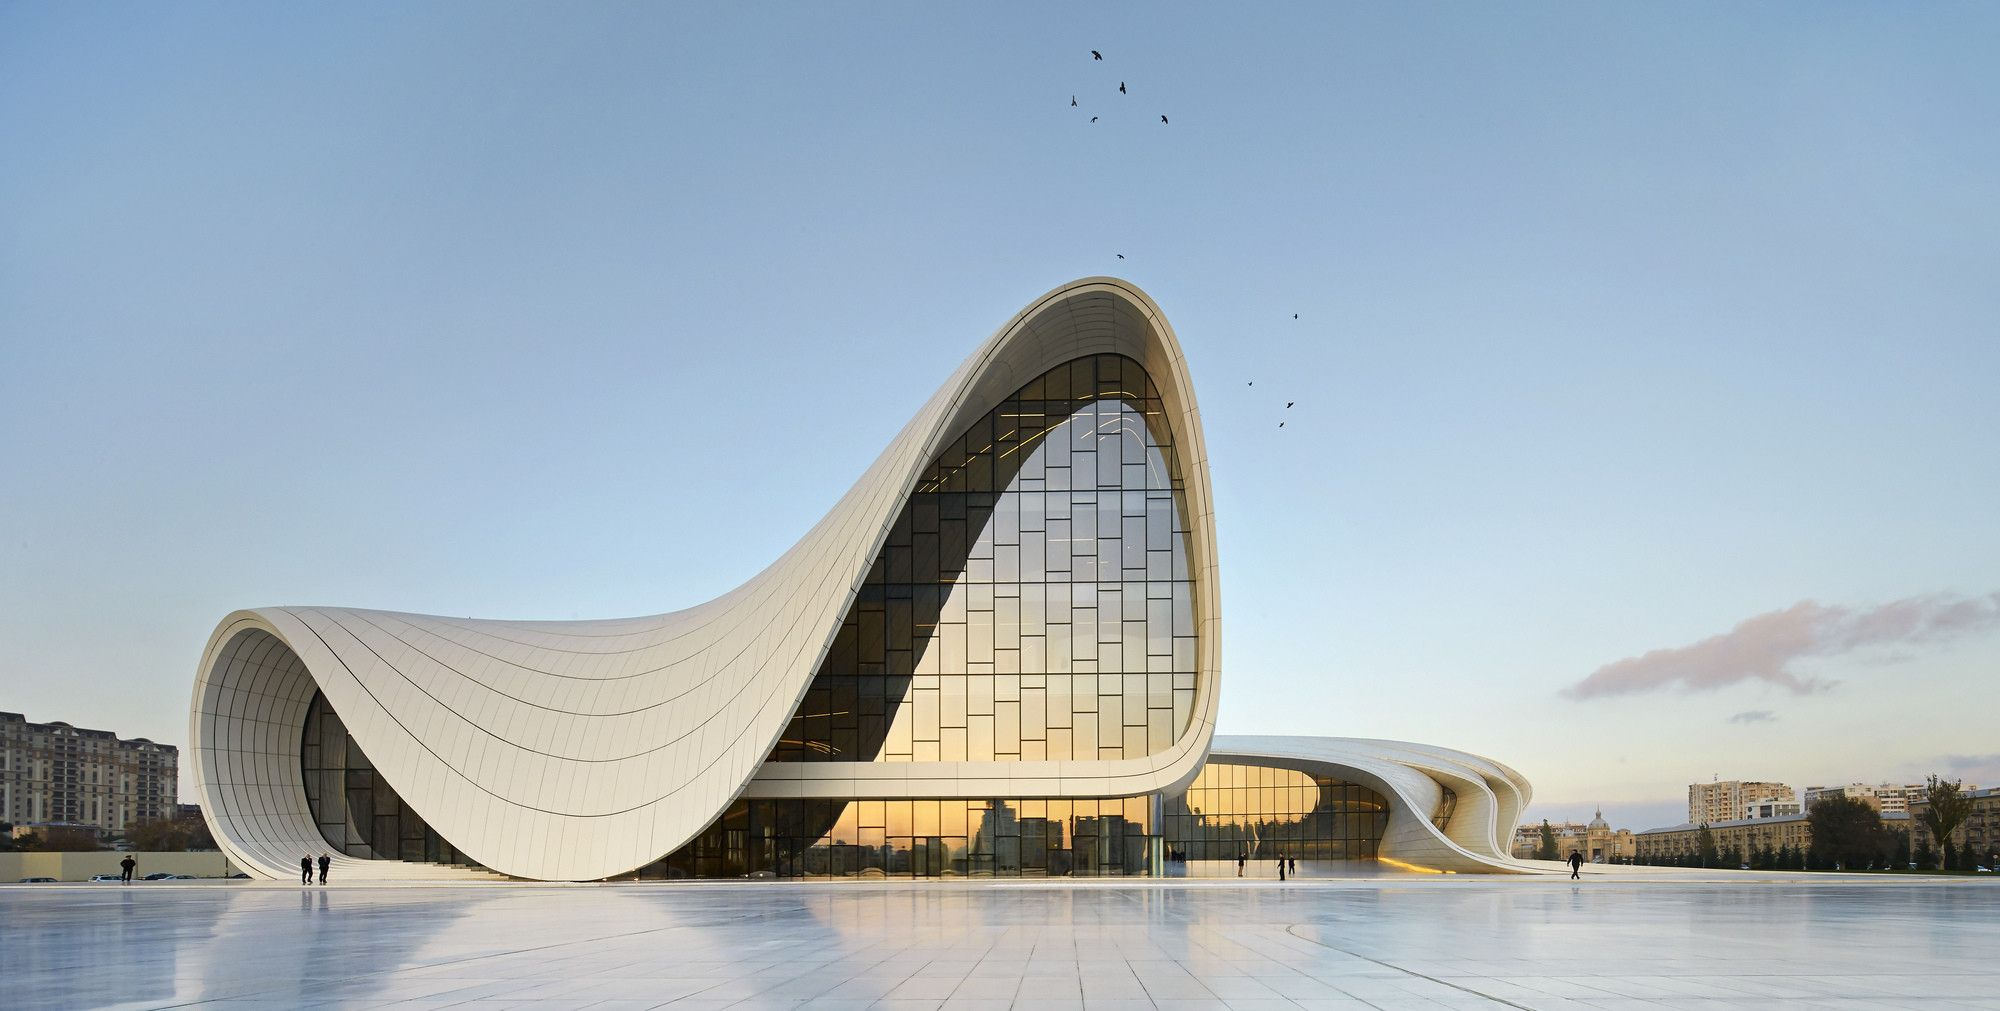 Spotlight: Zaha Hadid. Baku AzerbaijanZaha Hadid ArchitectsModern  ArchitecturePublic ArchitectureBuilding ArchitectureCrowCentreHarpThe  Architect